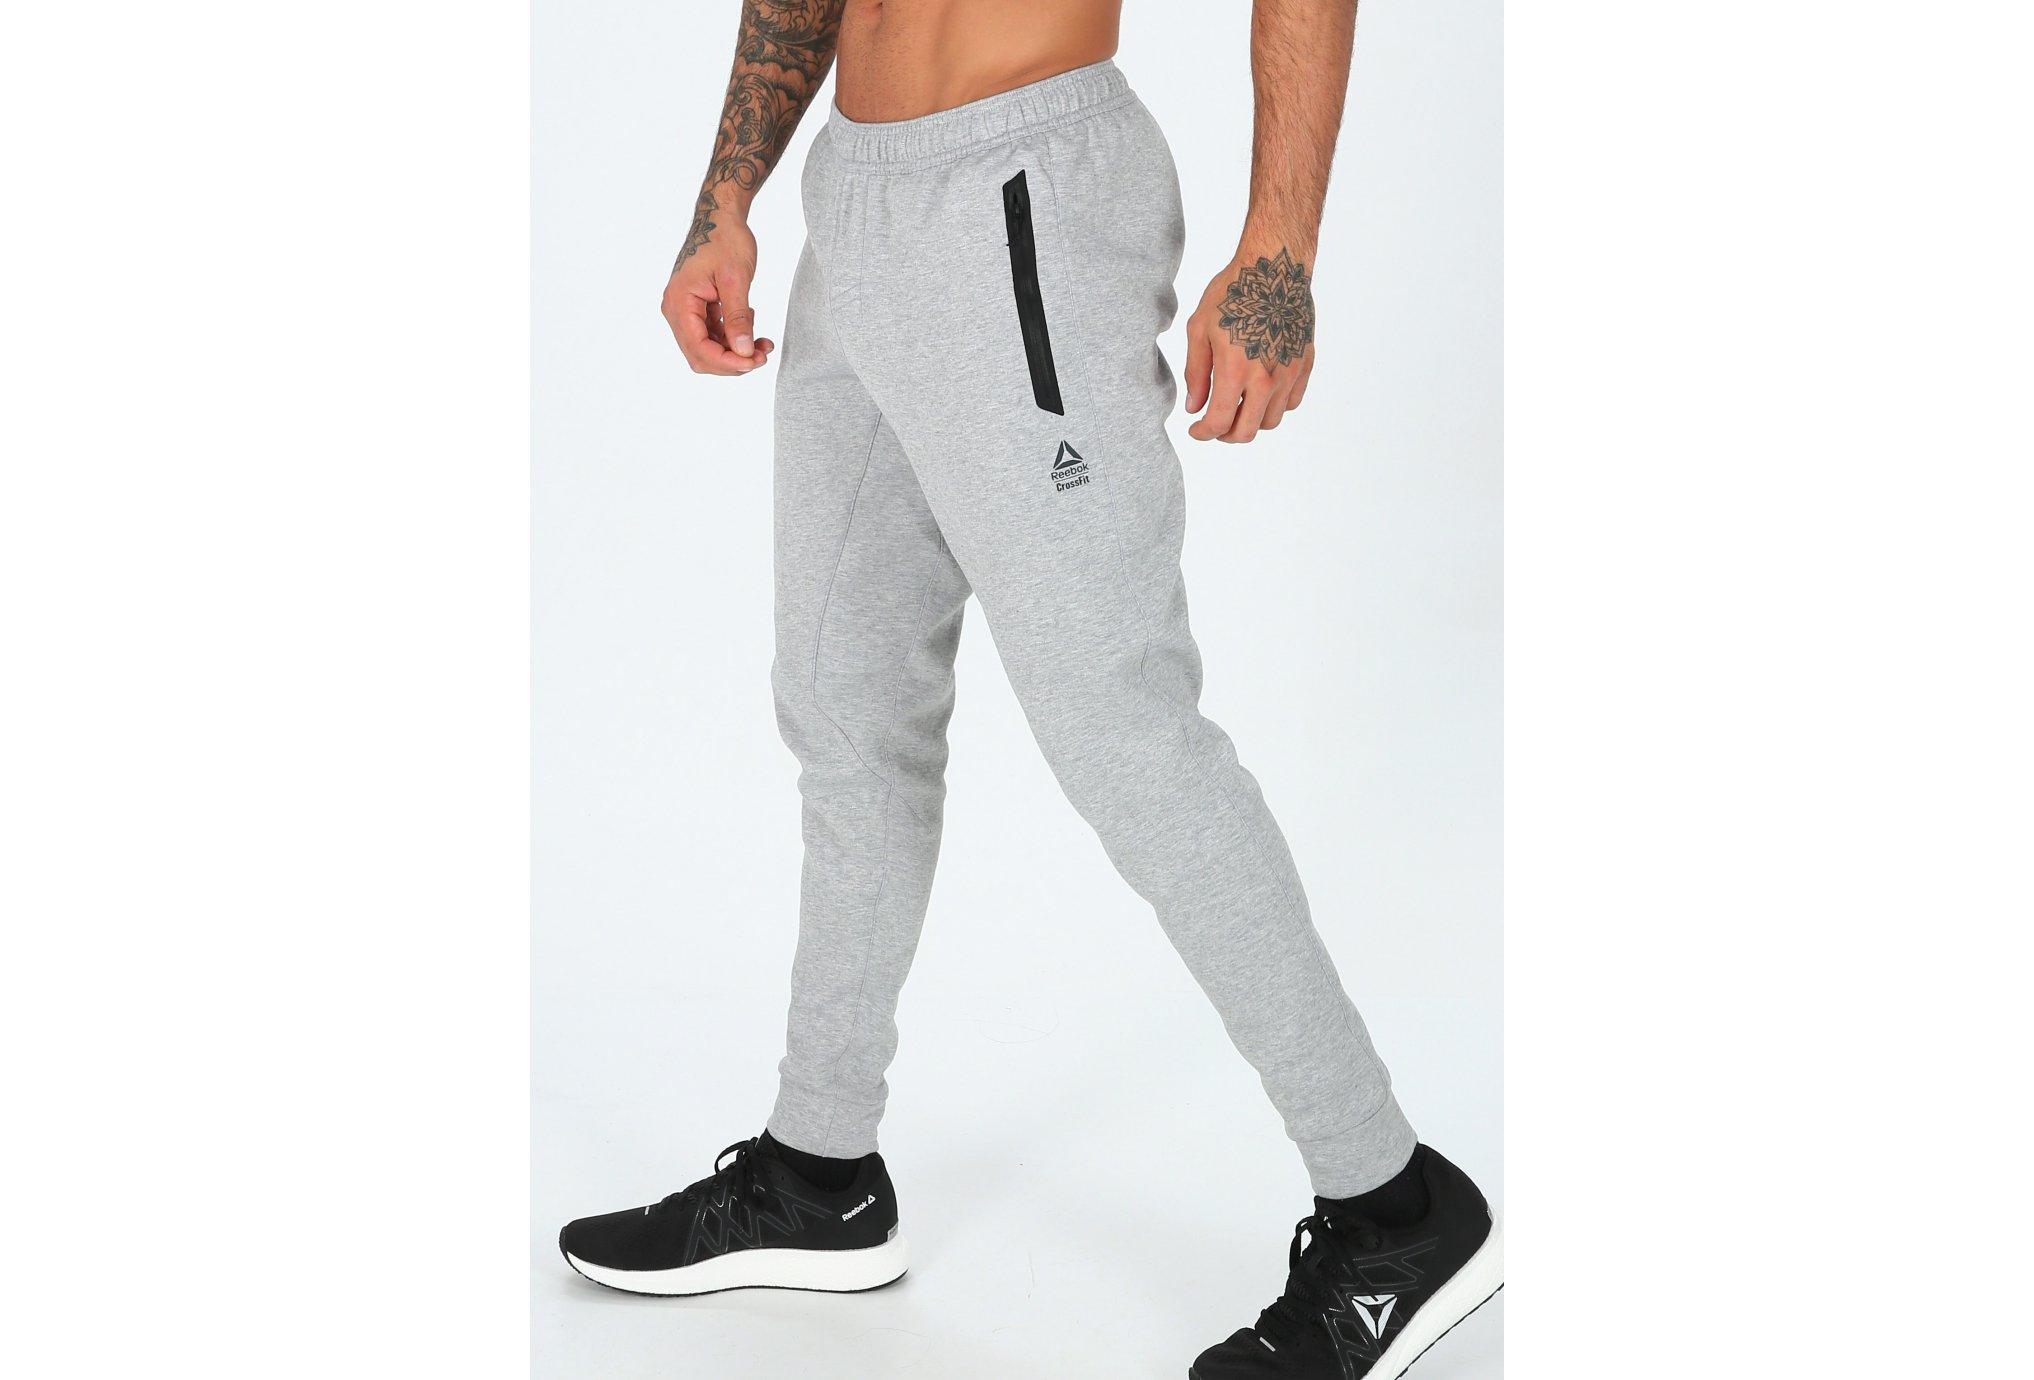 Reebok CrossFit Double Knit M vêtement running homme